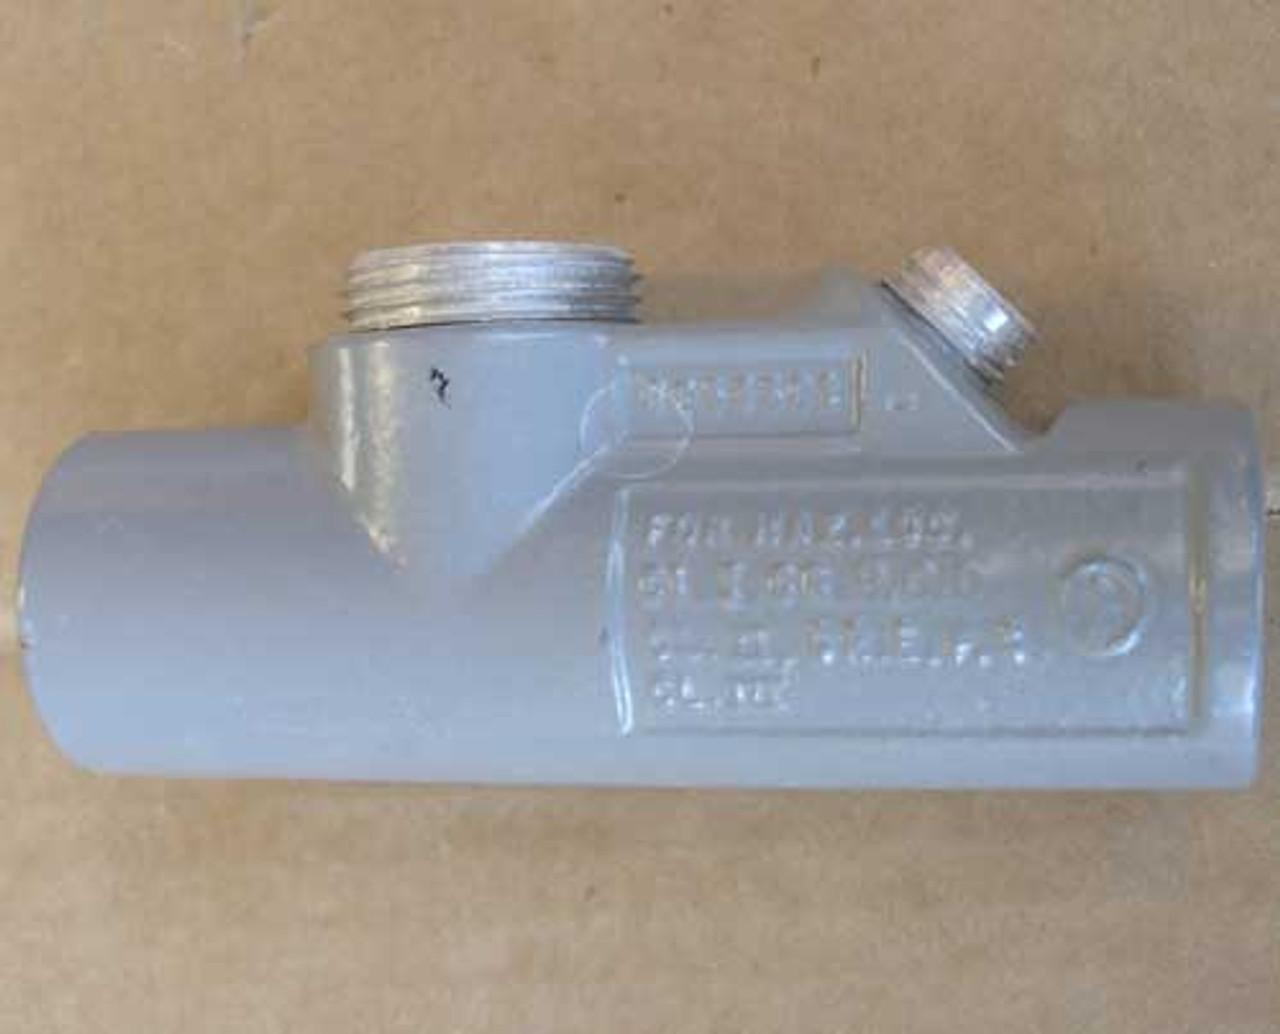 "Hubbell Killark ENY-5 Explosion-Proof Sealing Fitting 1-1/2"" - New"